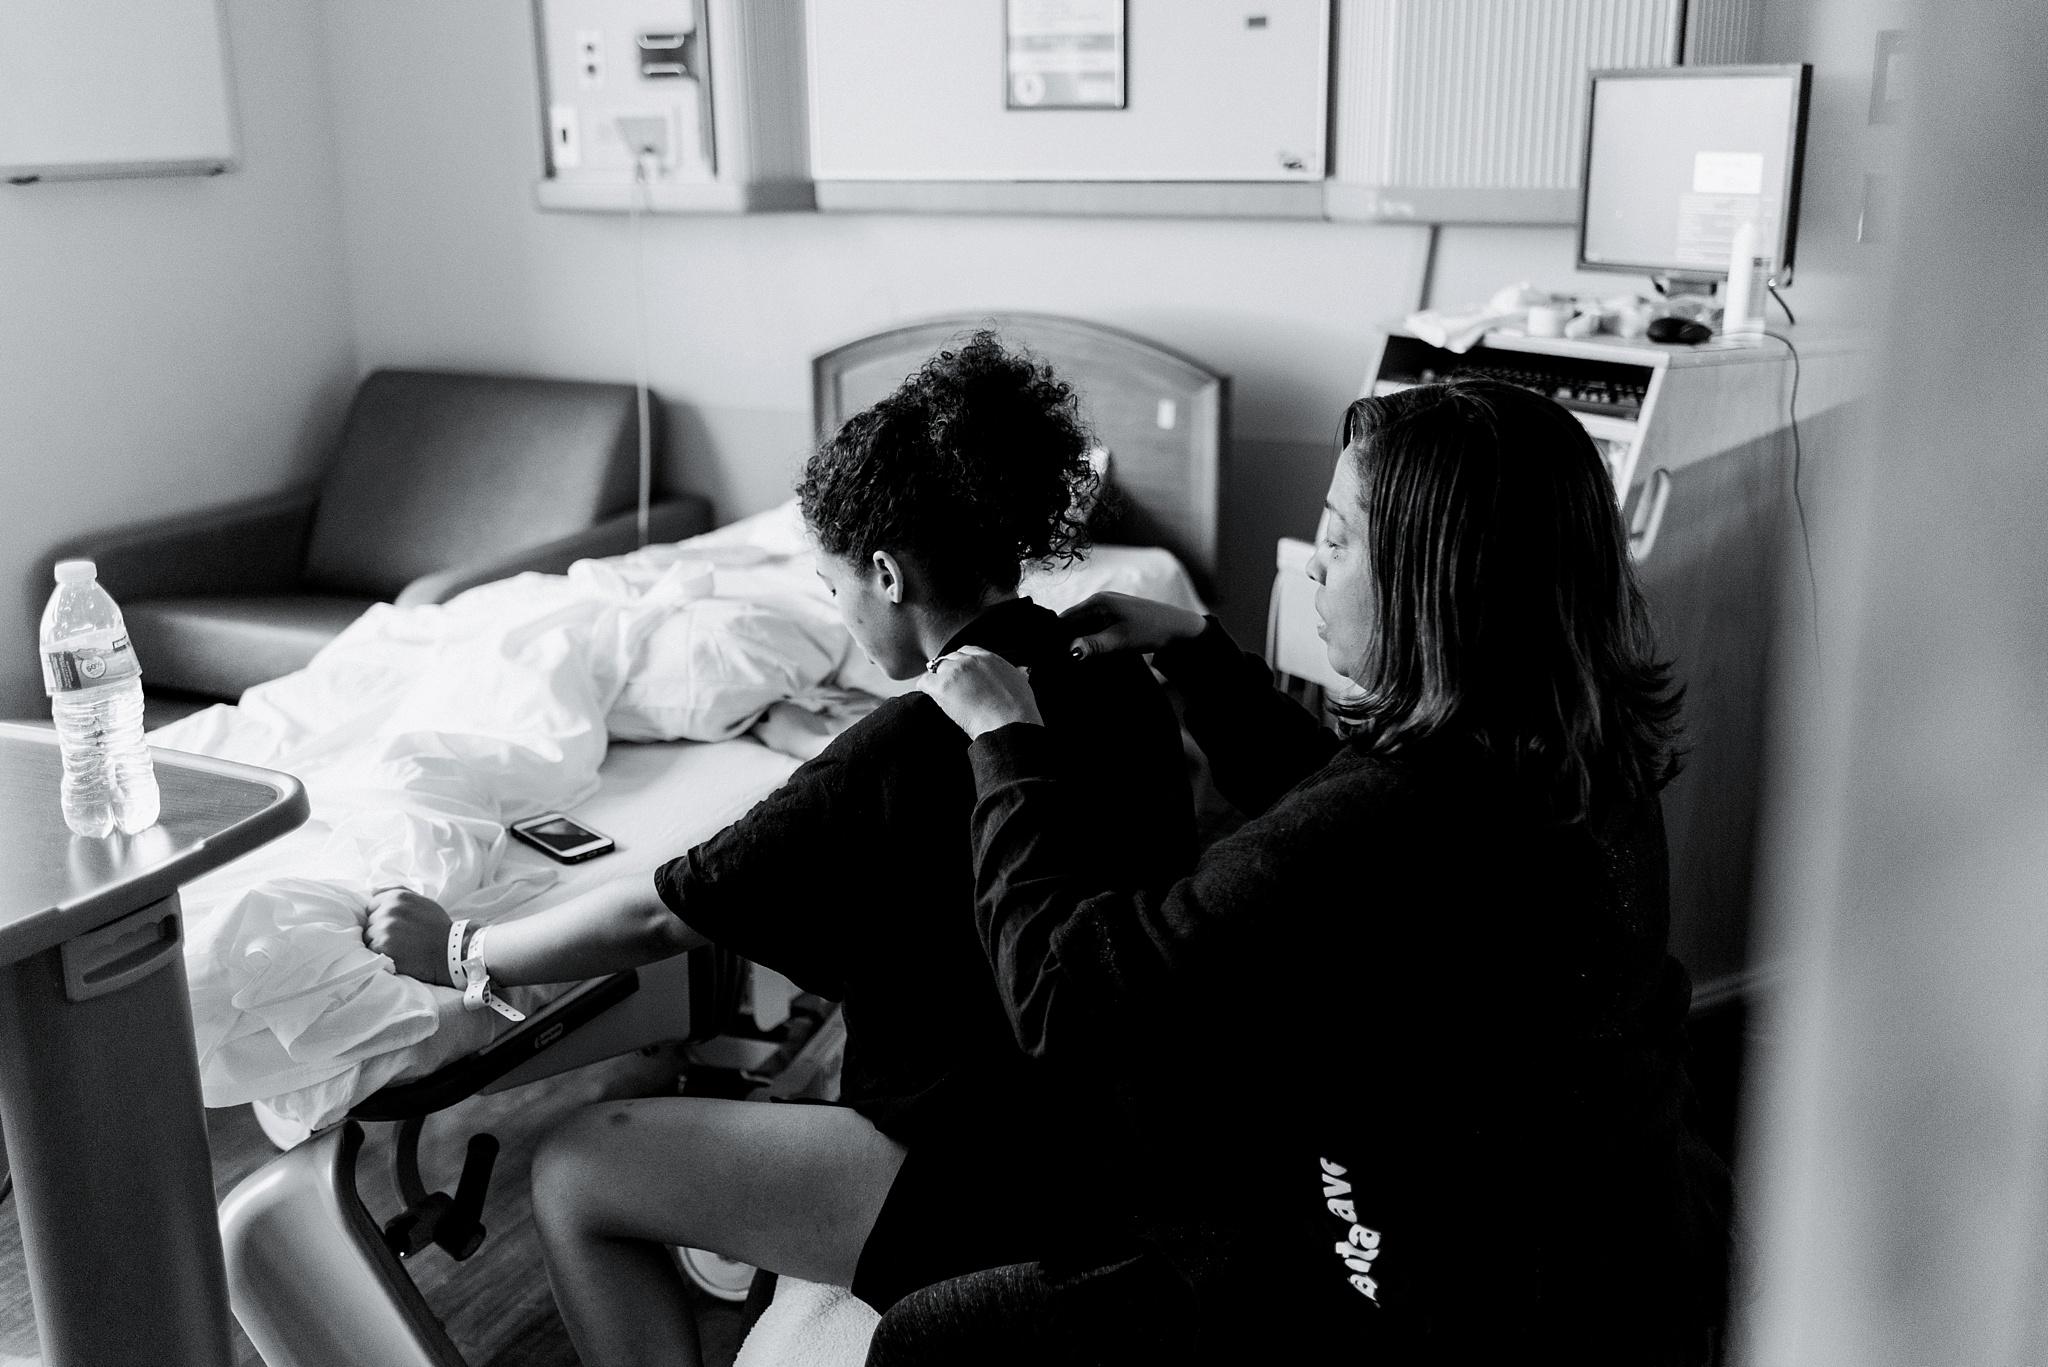 atlanta-medical-center-birth-photographer-nykole-smith-153.jpg